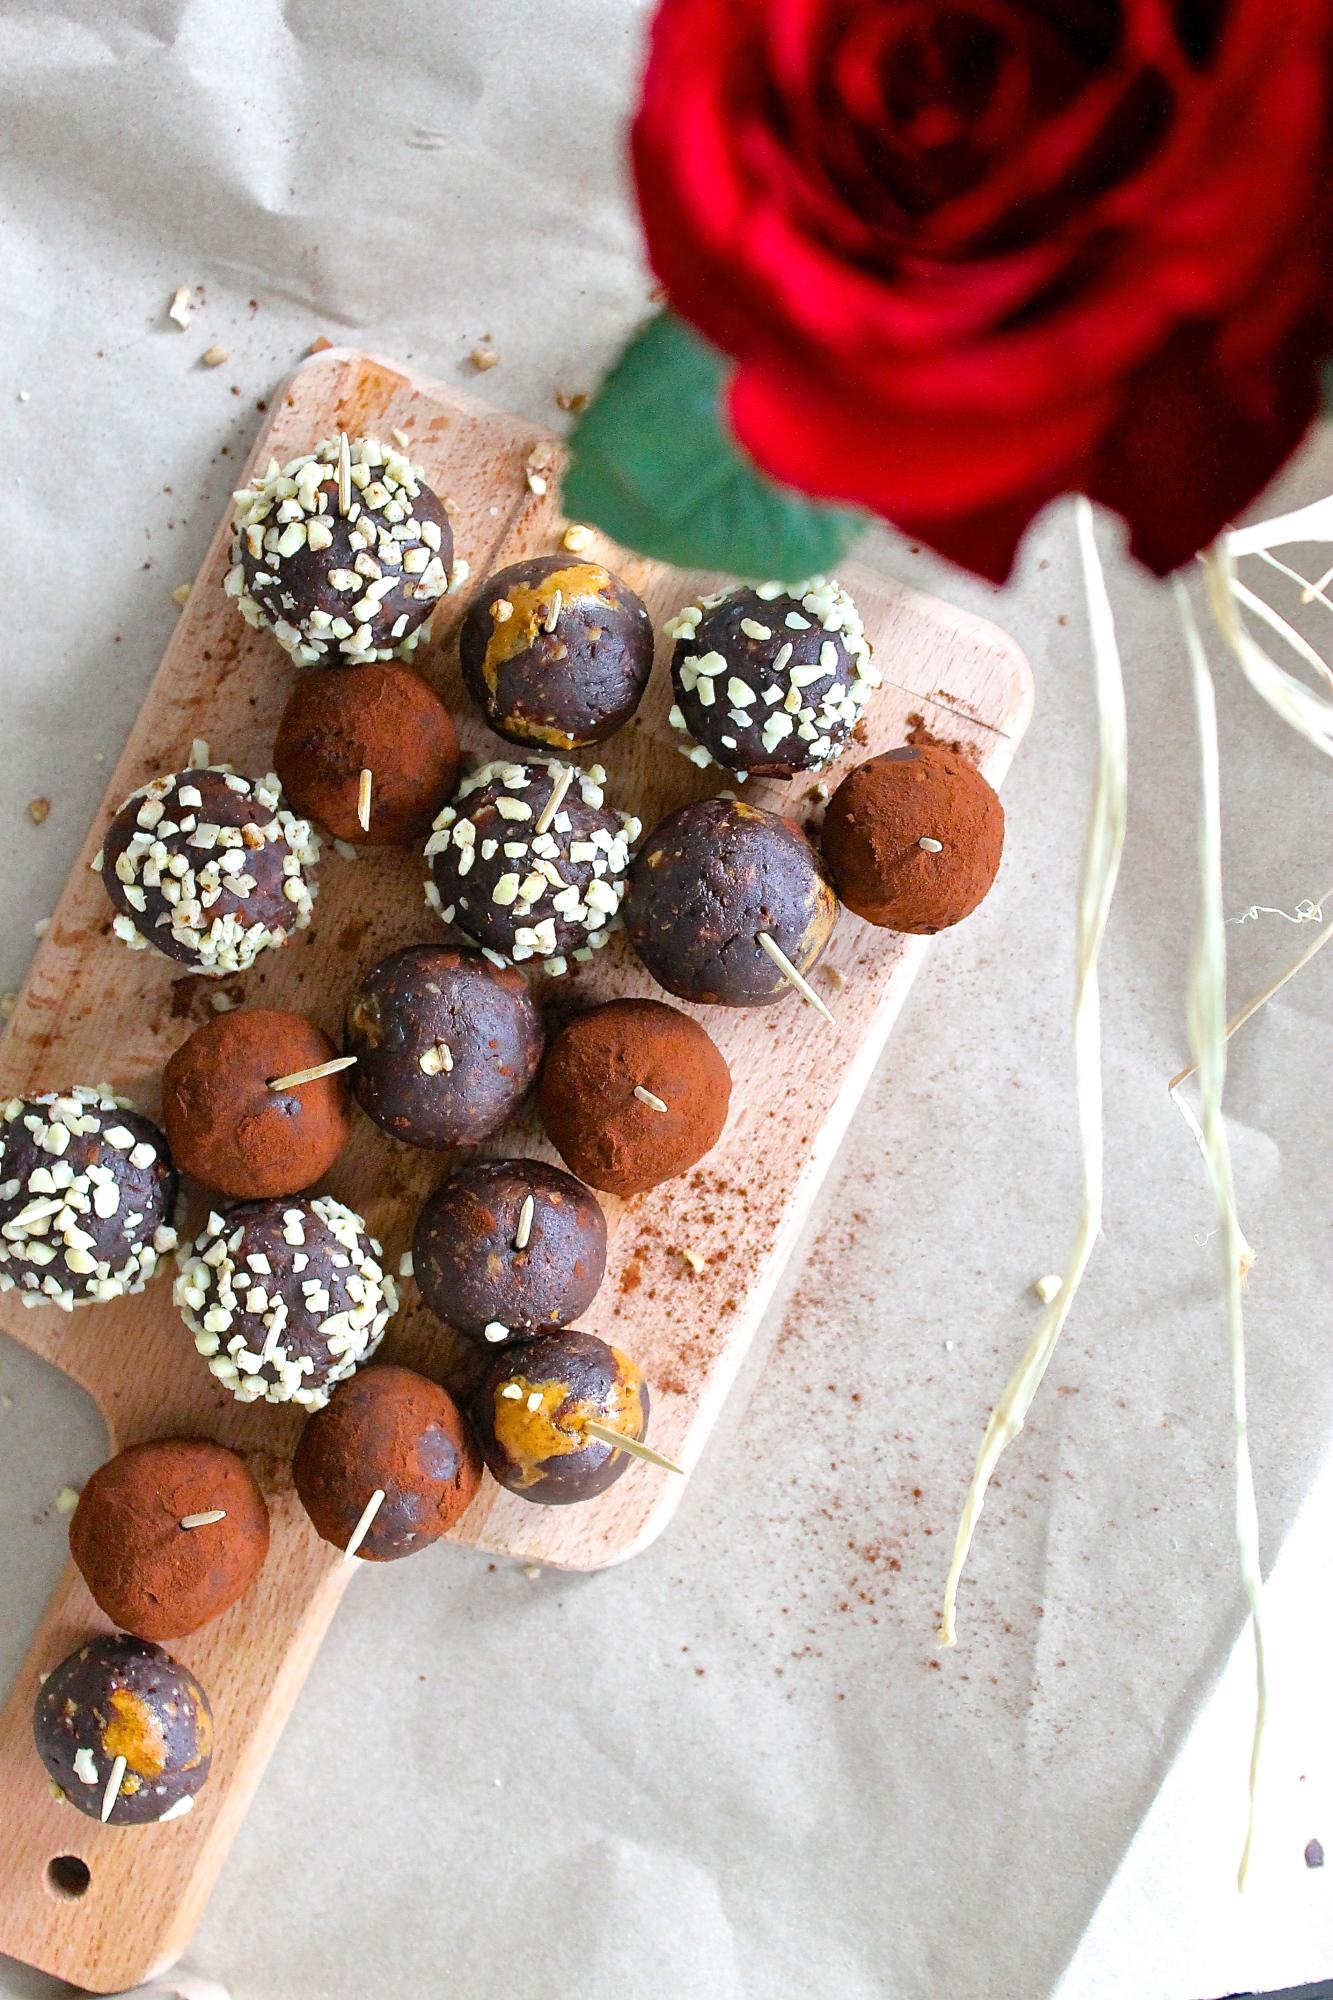 seductive chocolate peanut butter bites